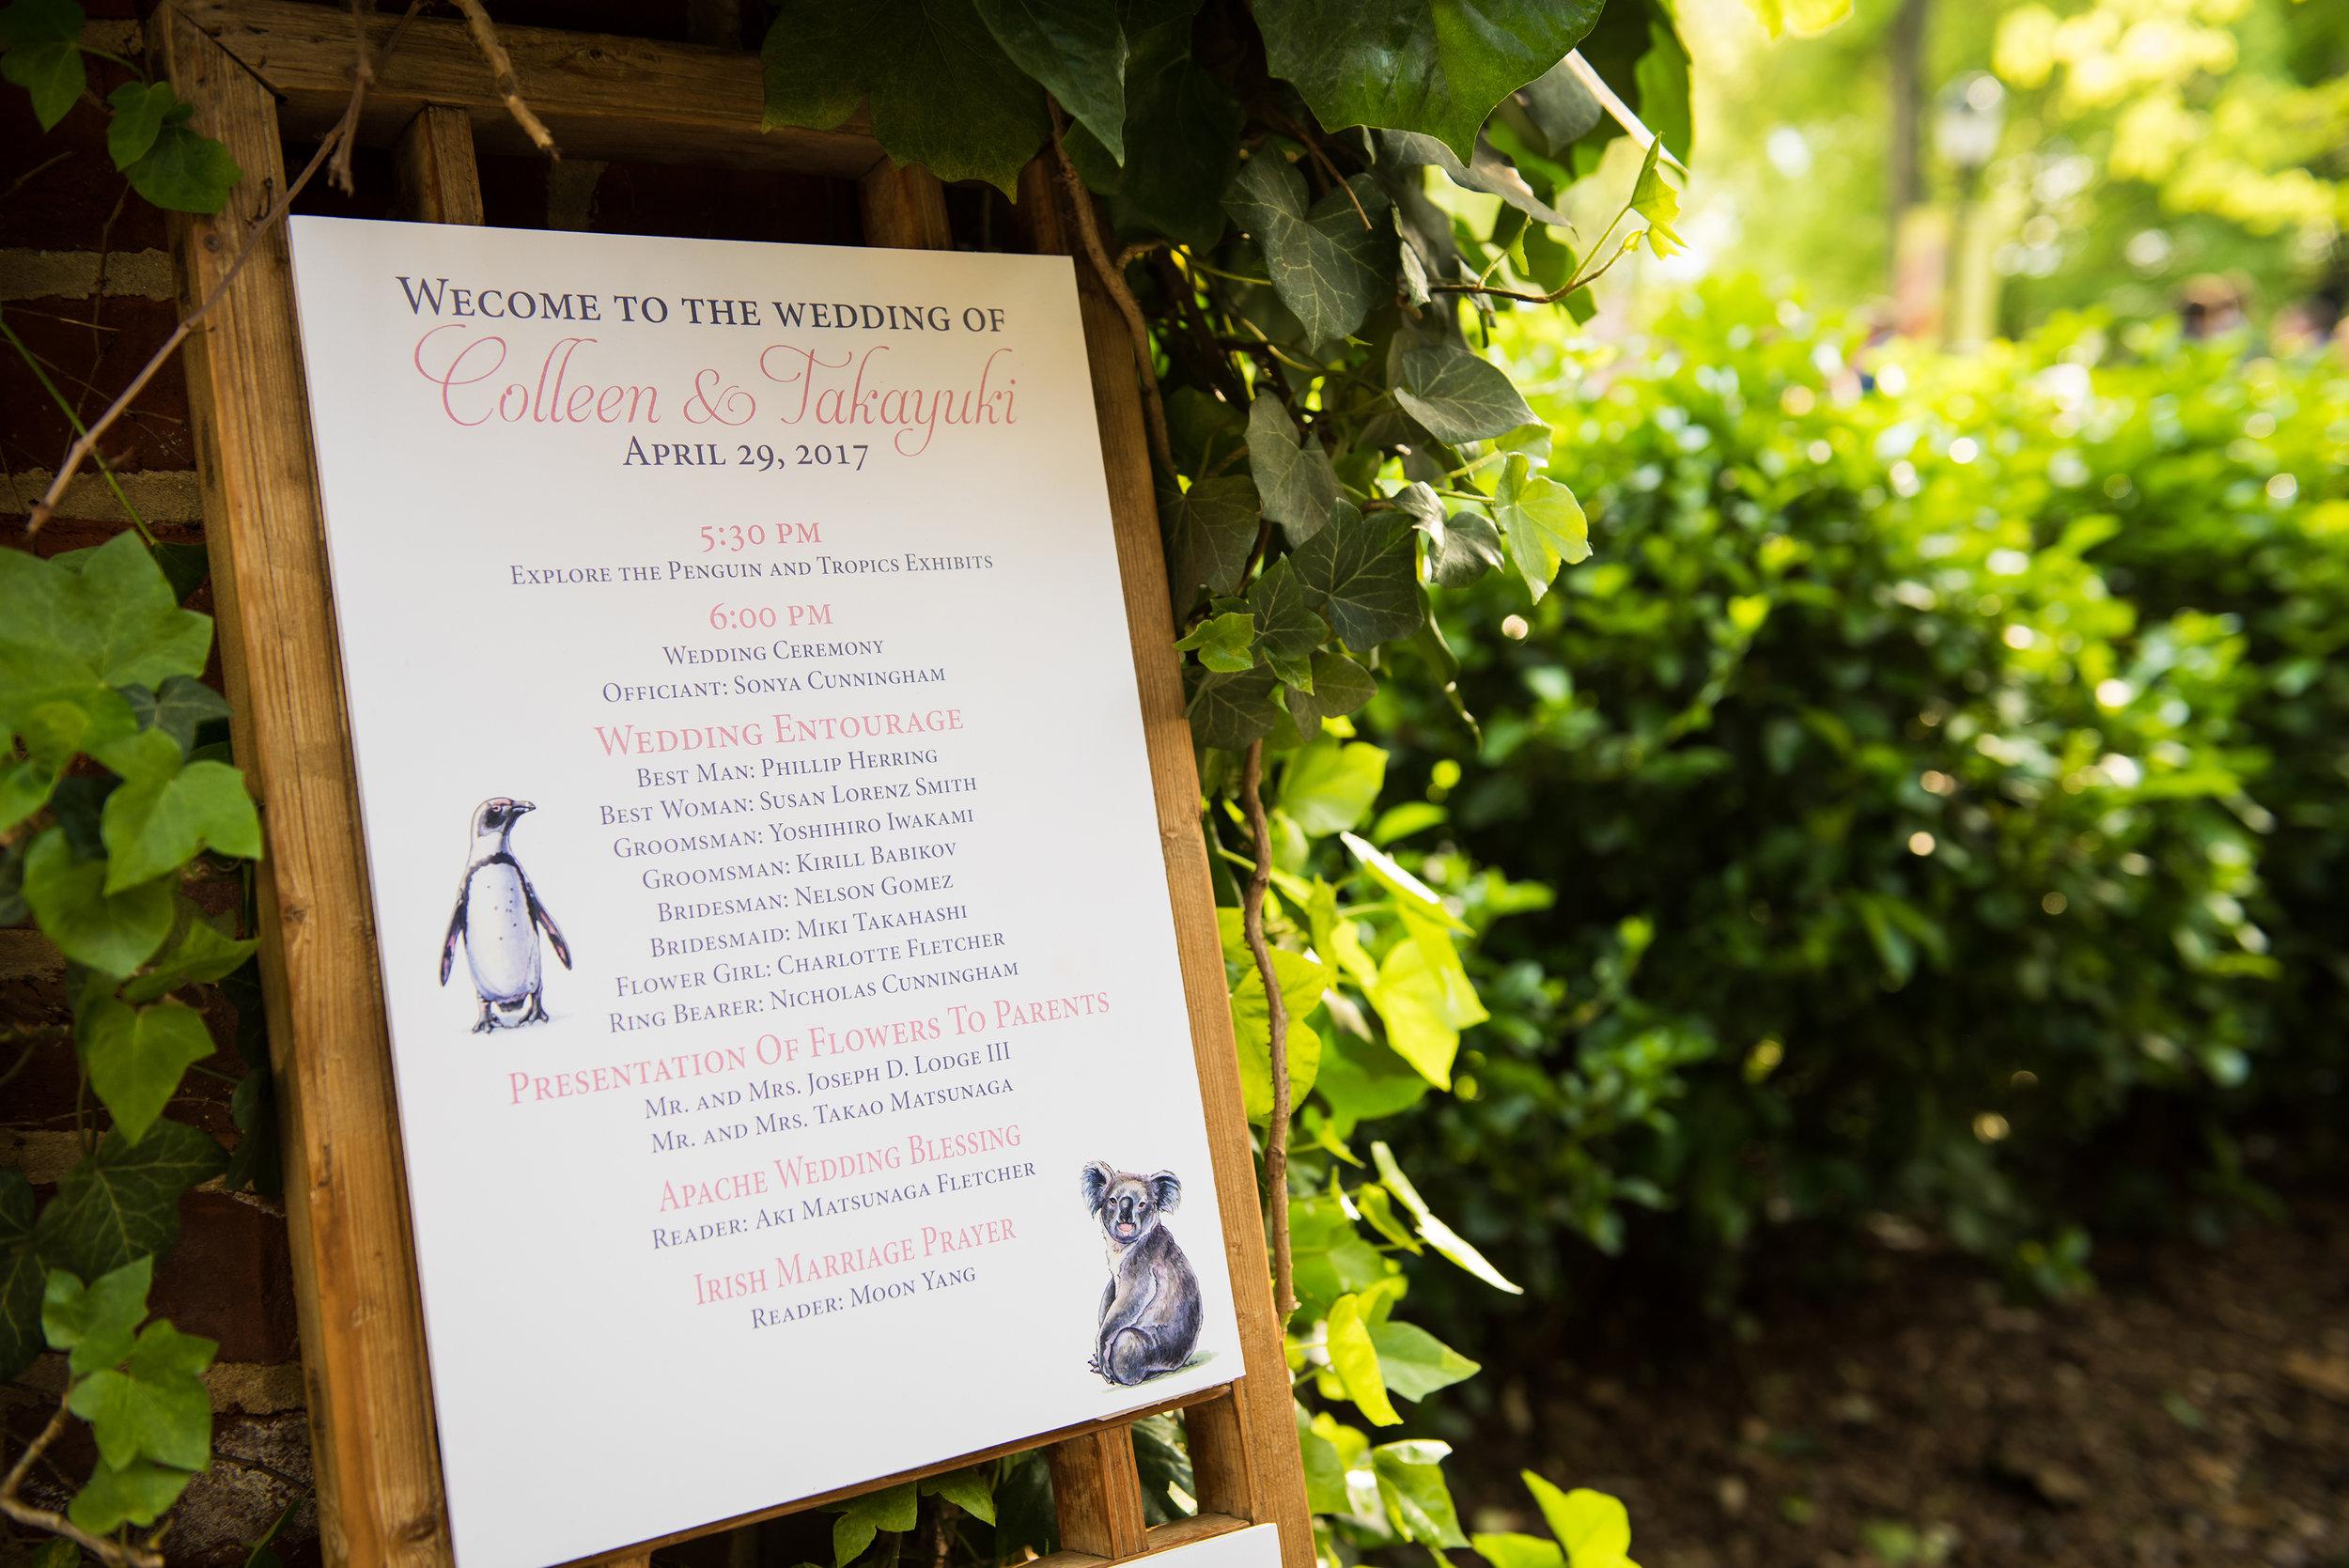 victorious-events-nyc-017-colleen-taka-central-park-zoo-wedding-raymond-hamlin.jpg